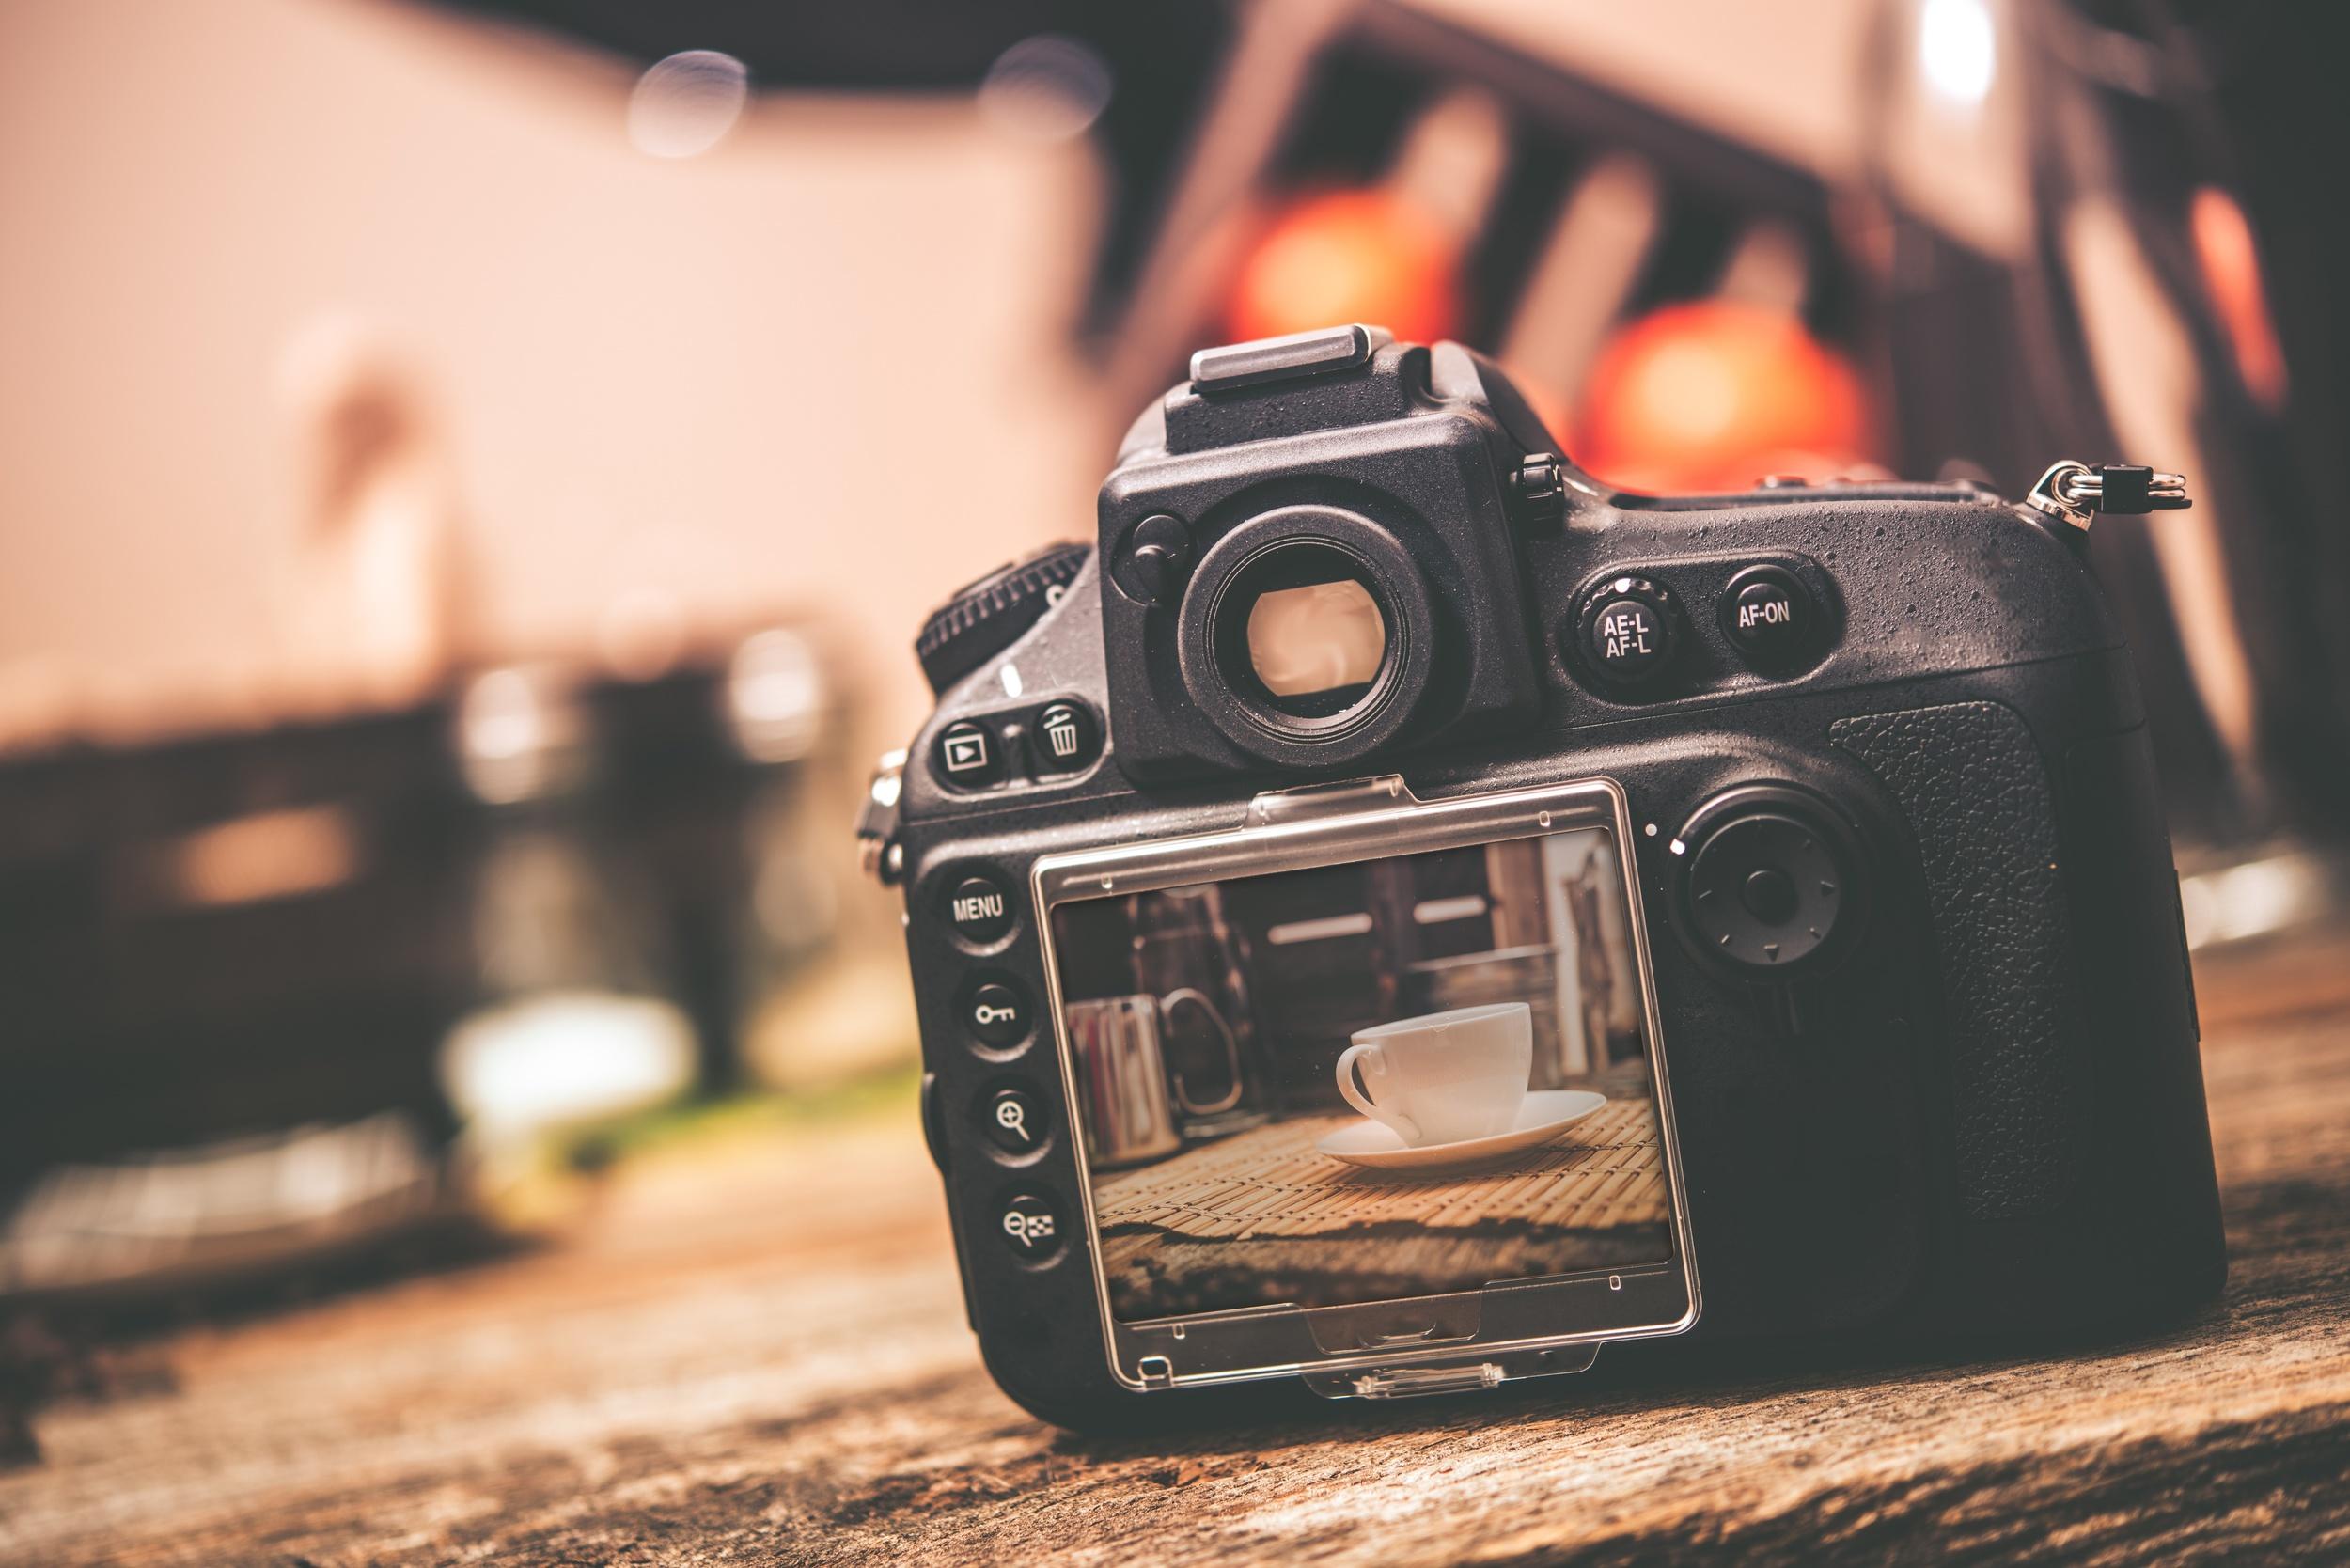 camera on table.jpg